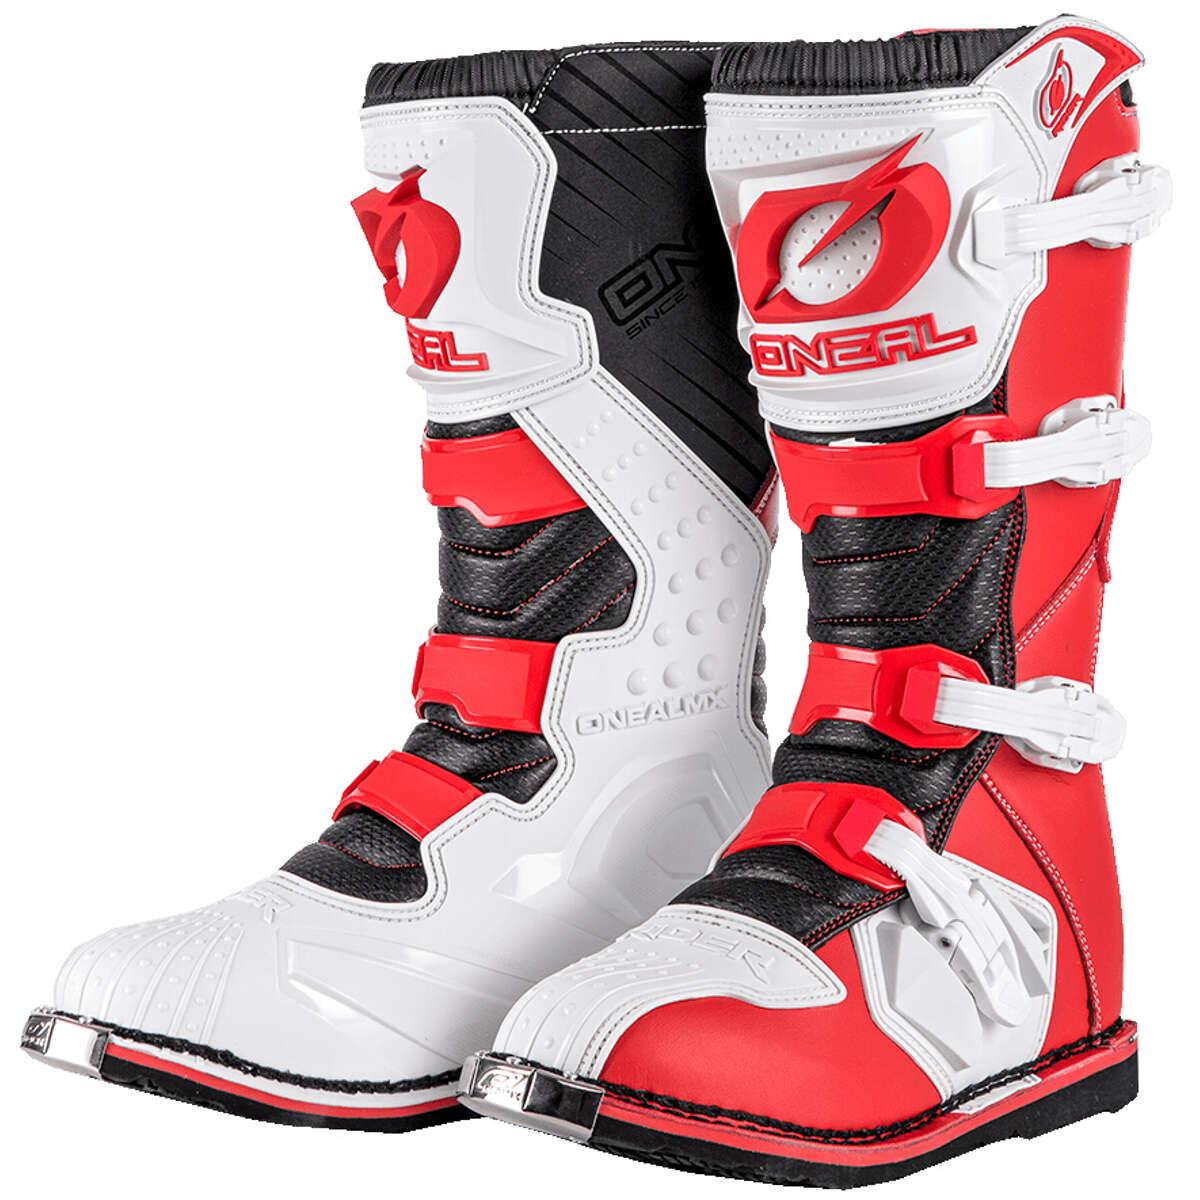 Cross Stiefel O'Neal Rider Rot Weiß